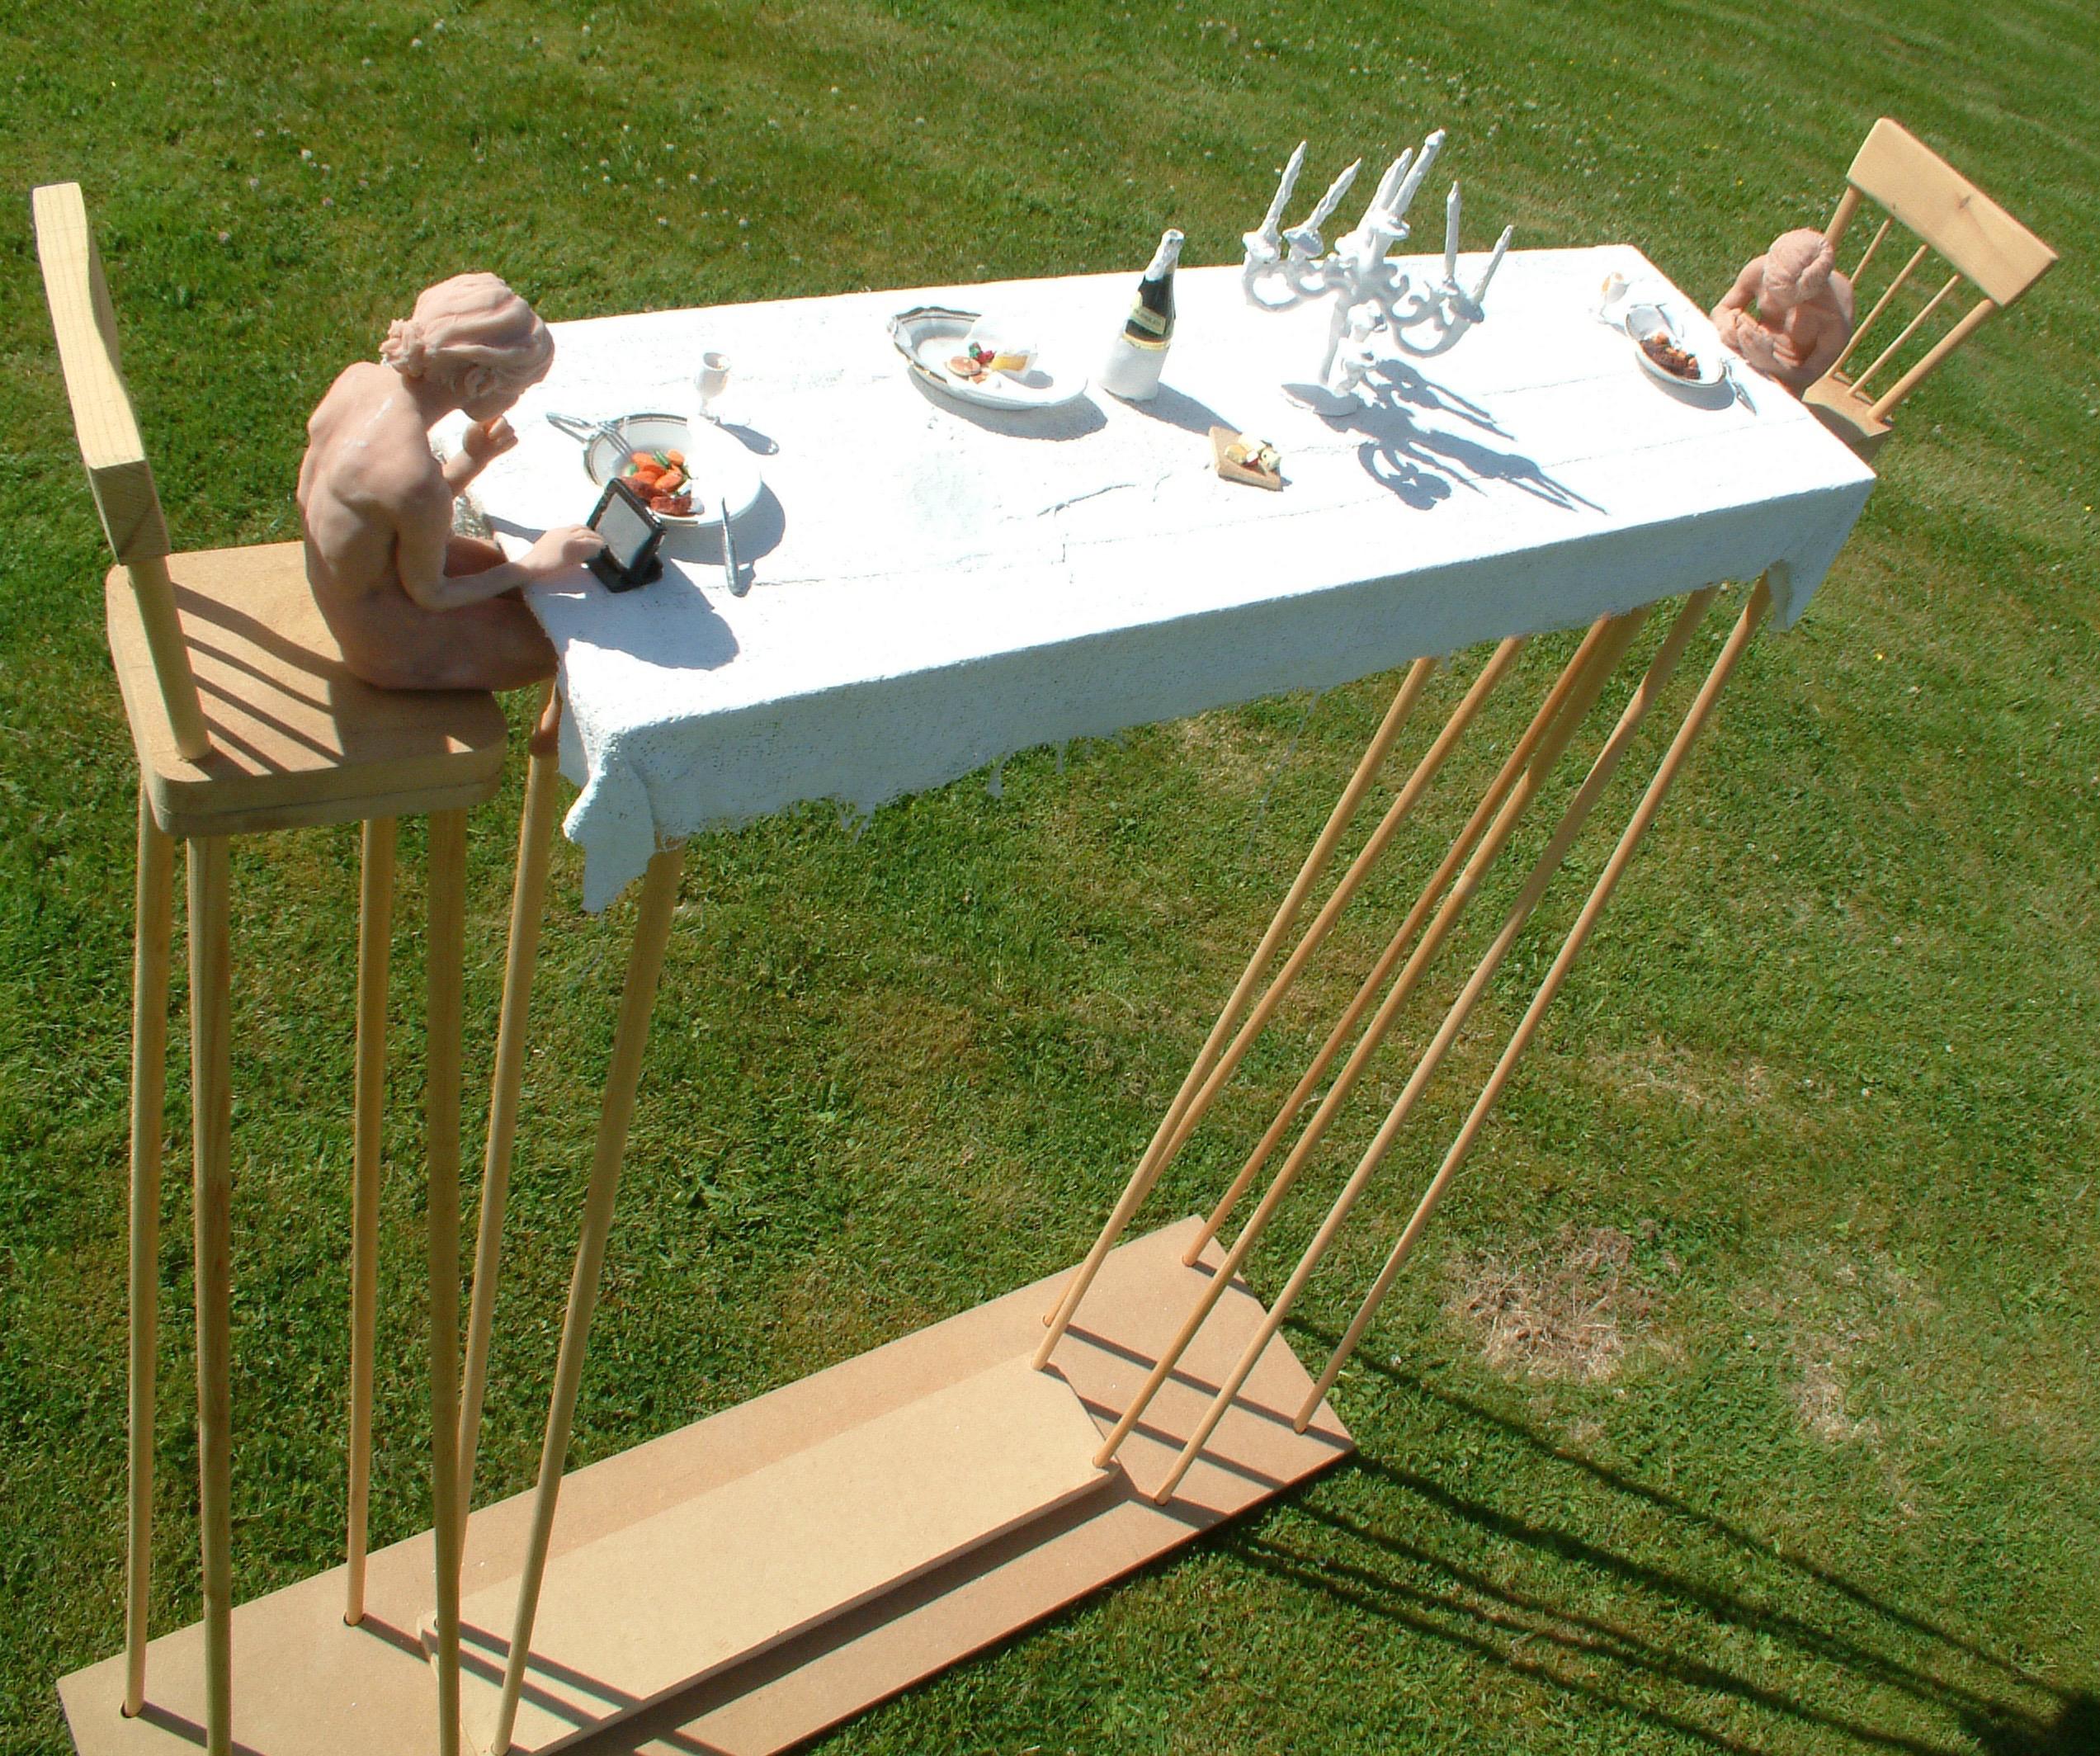 sculpture artwork cake